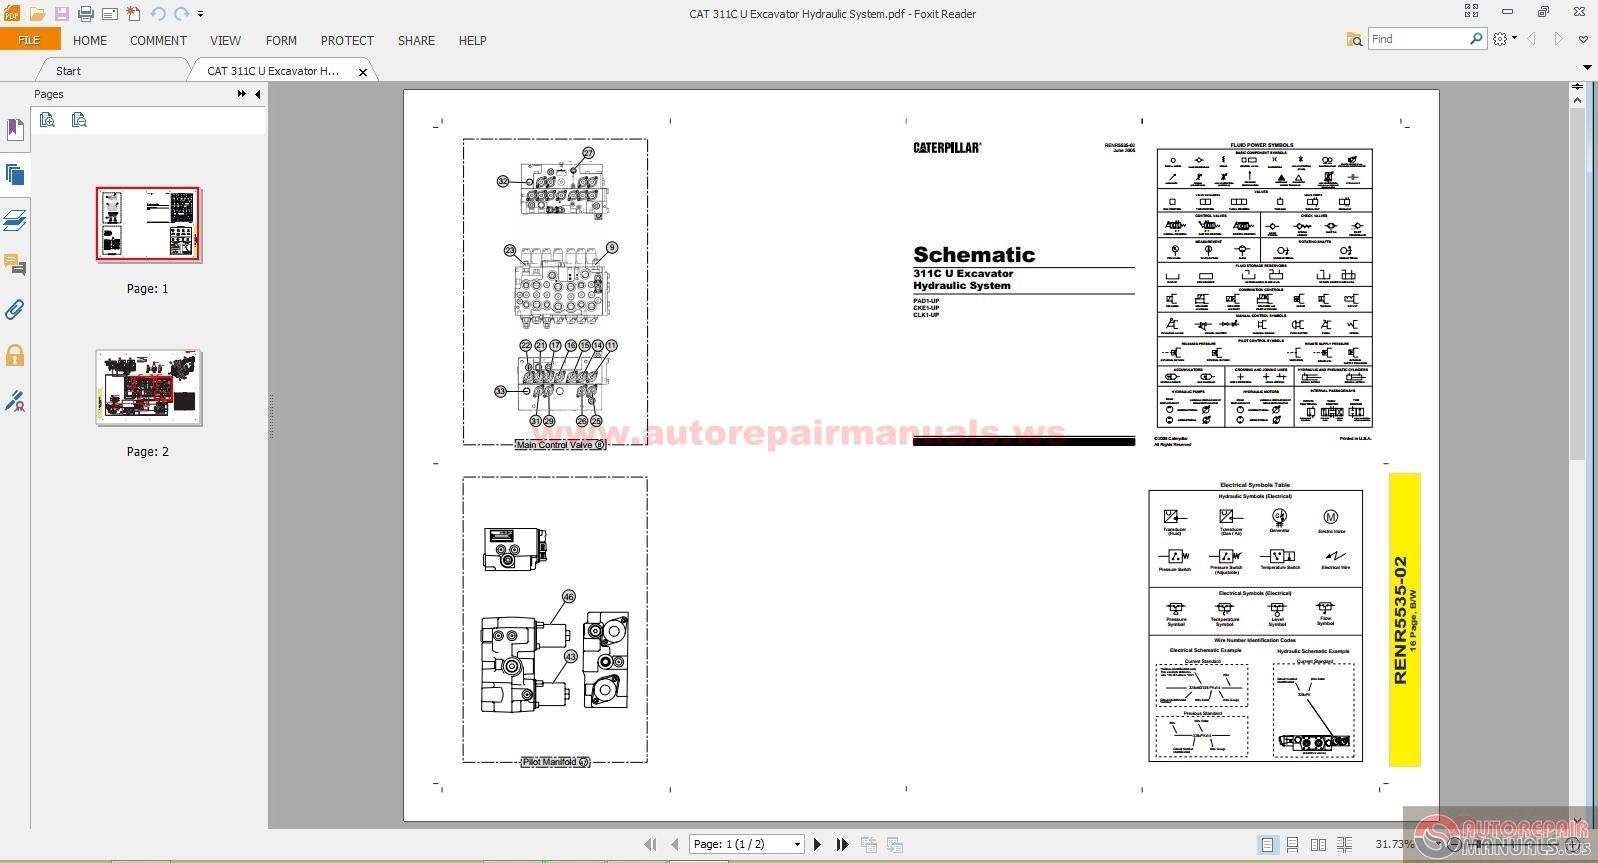 Cat m320 Manual